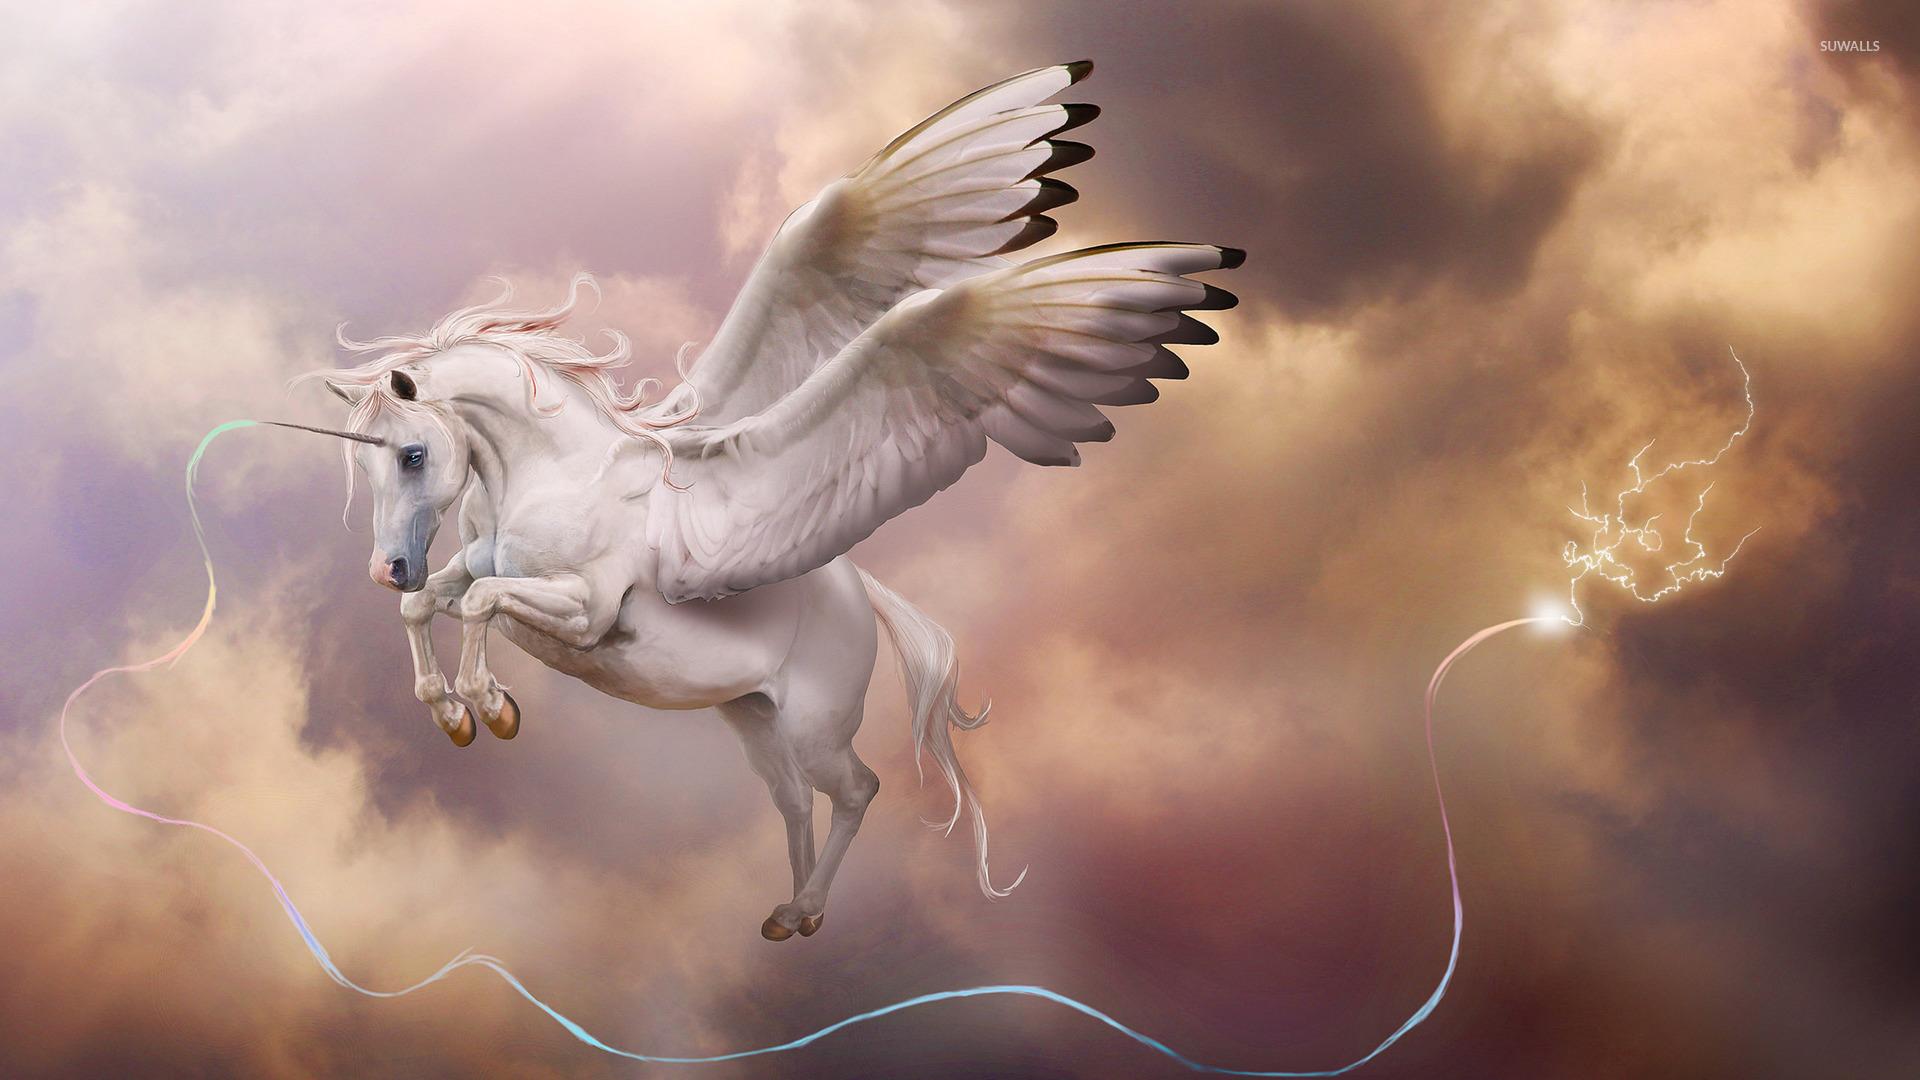 Pegasus unicorn wallpaper   Fantasy wallpapers   38388 1920x1080